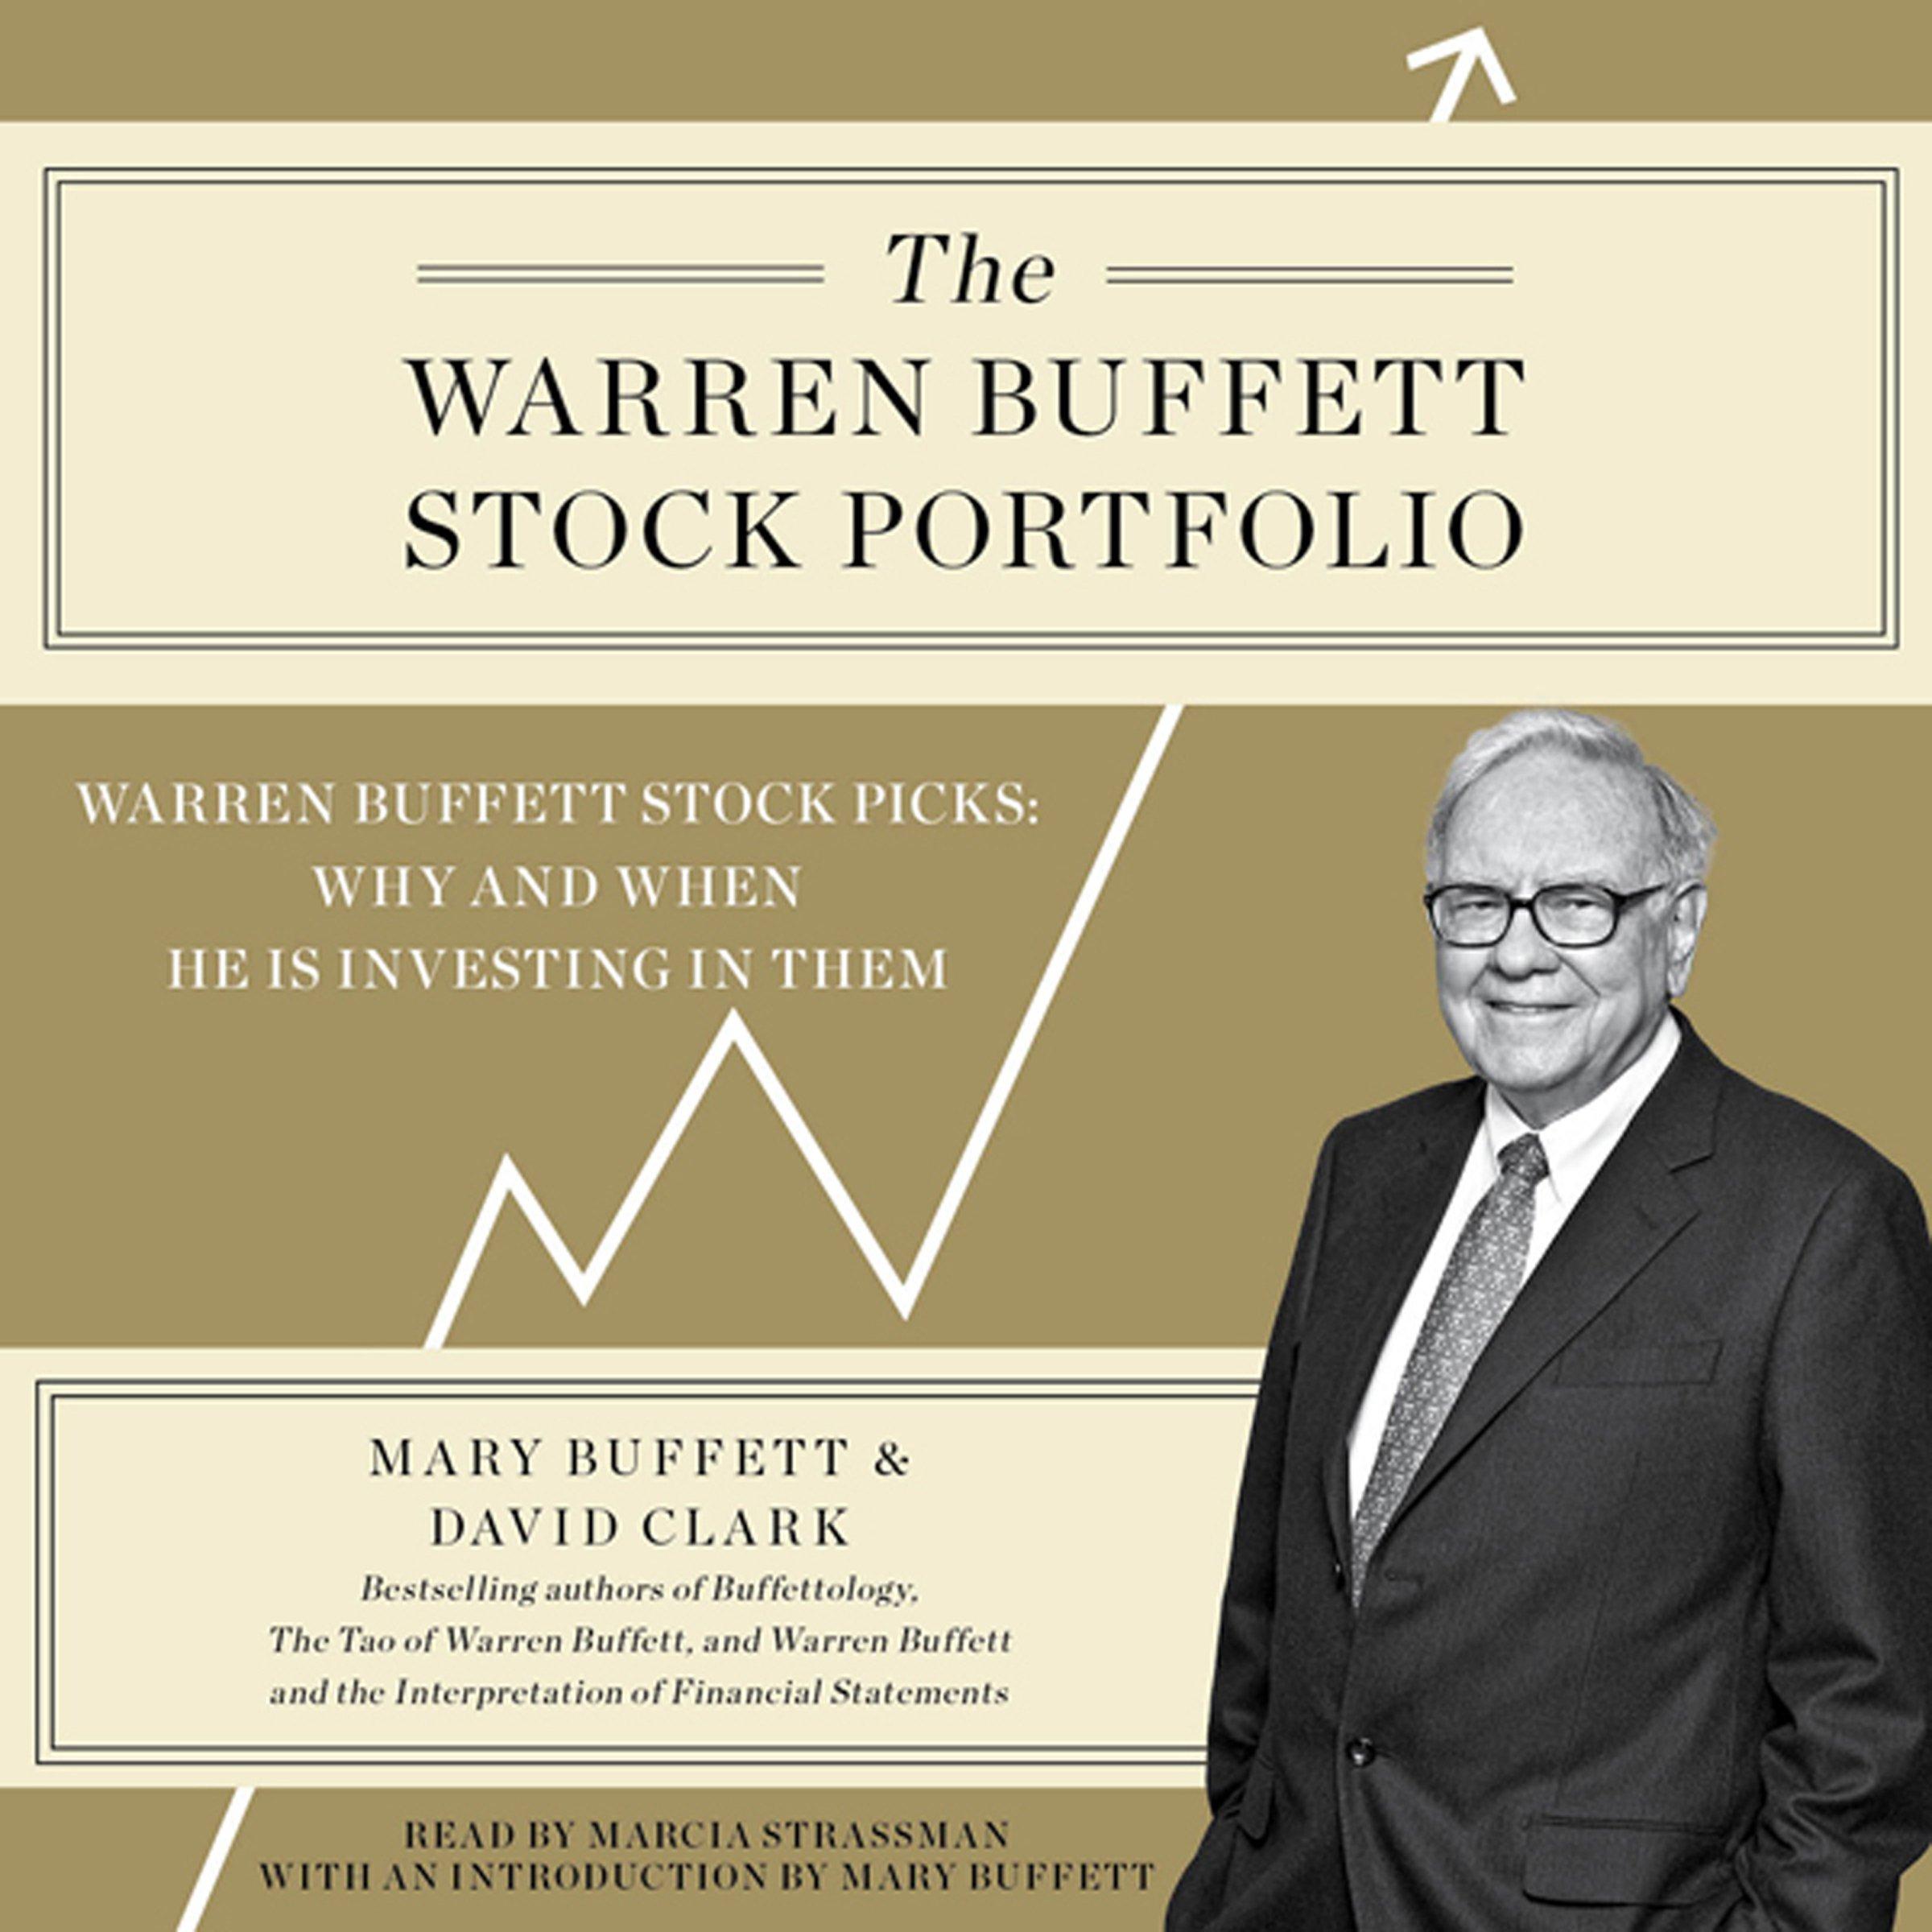 The Warren Buffett Stock Portfolio: Warren Buffett's Stock Picks: When and Why He Is Investing in Them